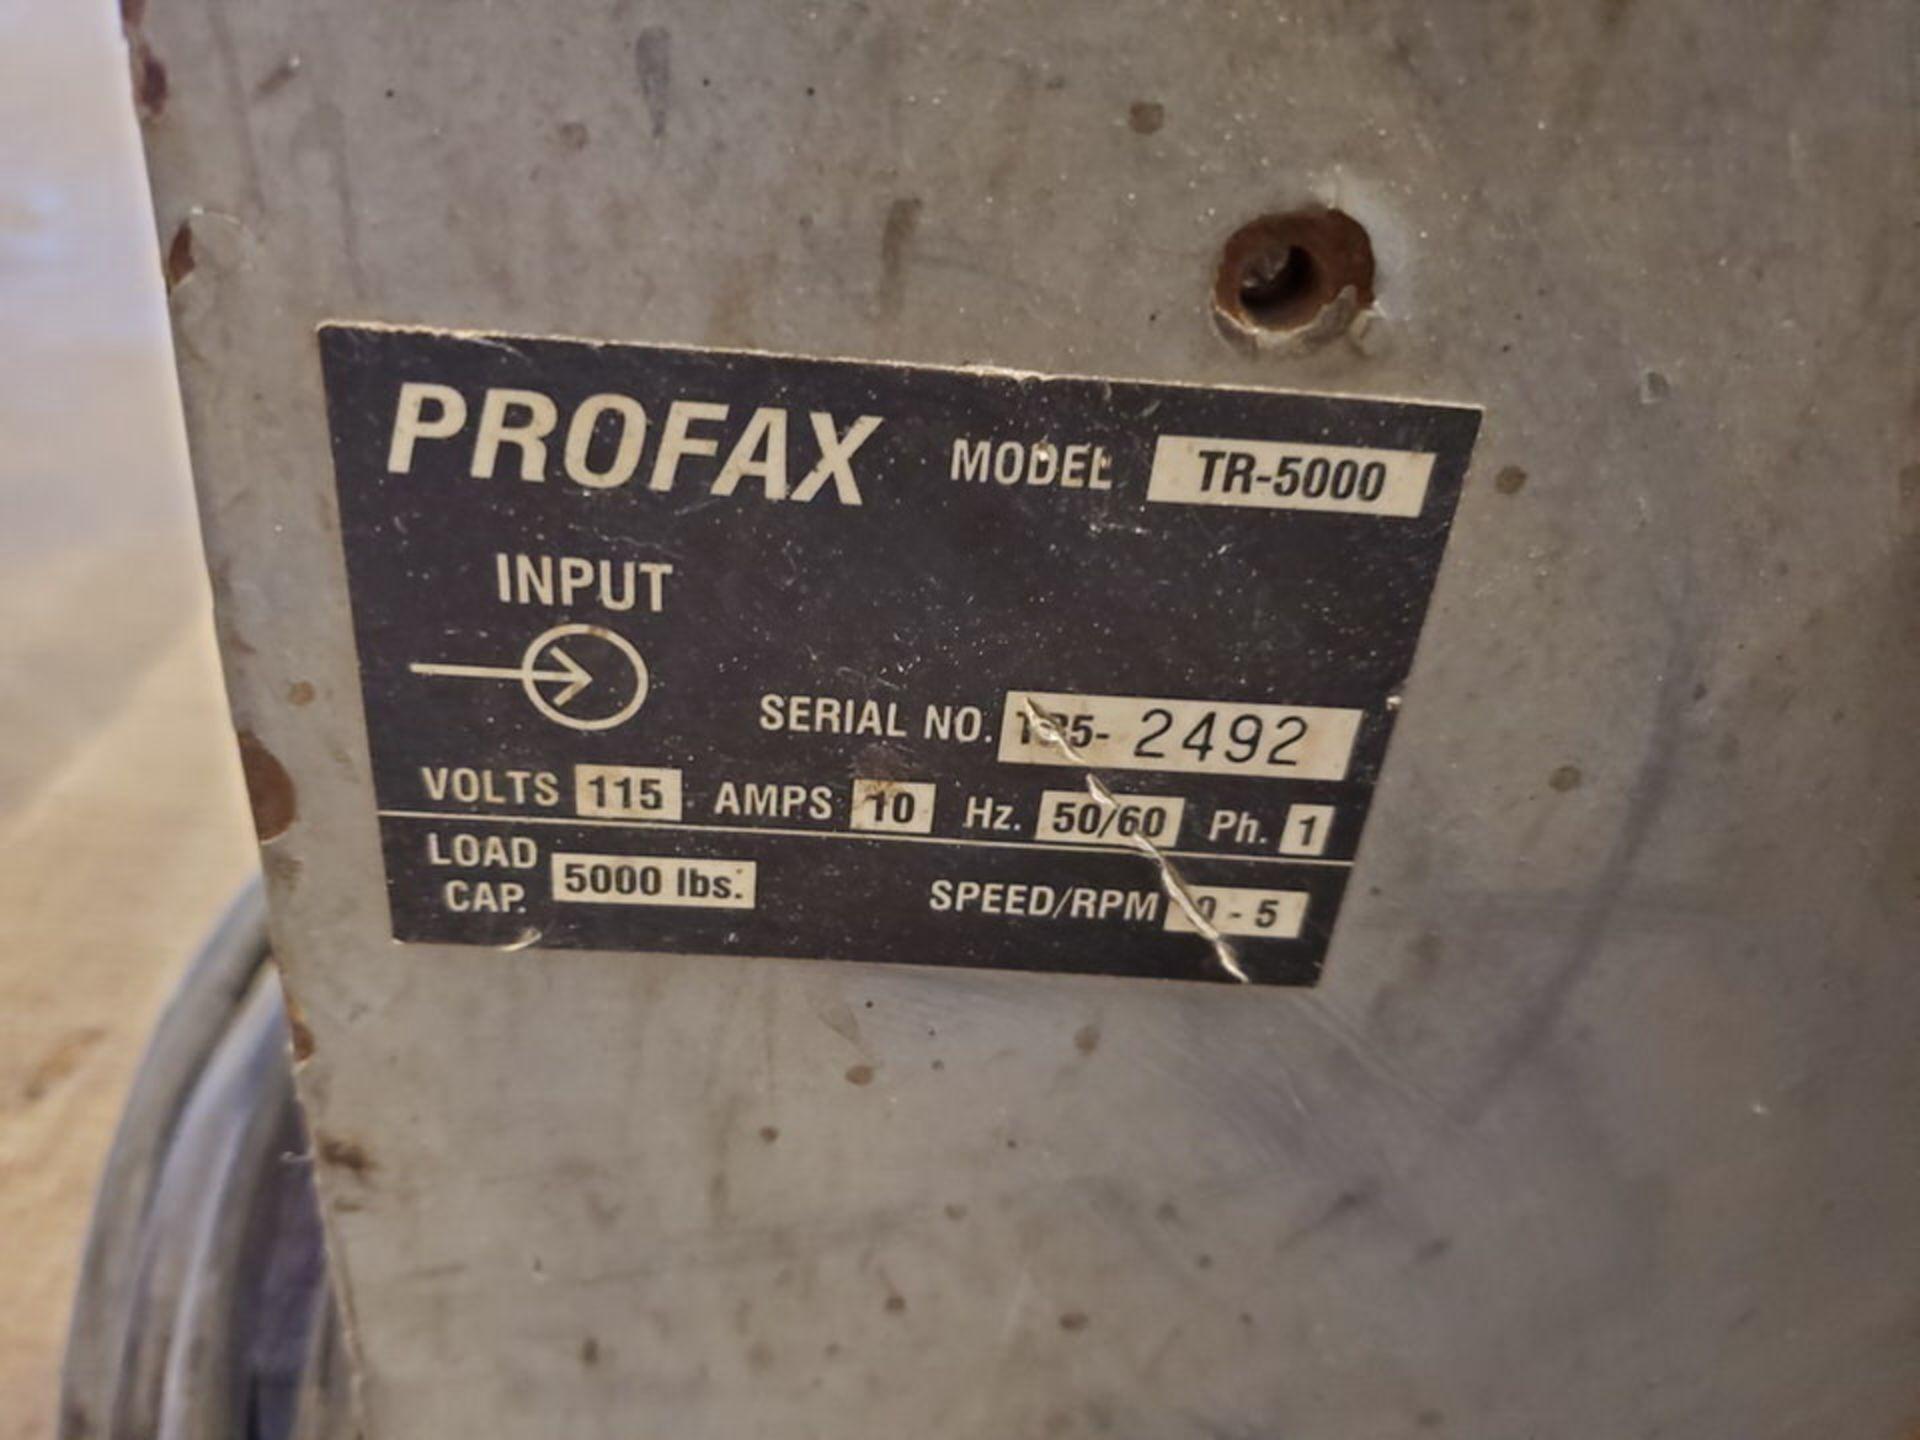 "Profax TR-5000 Turn Roll 5K Cap., 115V, 10A, 50/60HZ, 1PH, RPM: 0-5; 3"" Wheel Dia. - Image 7 of 7"